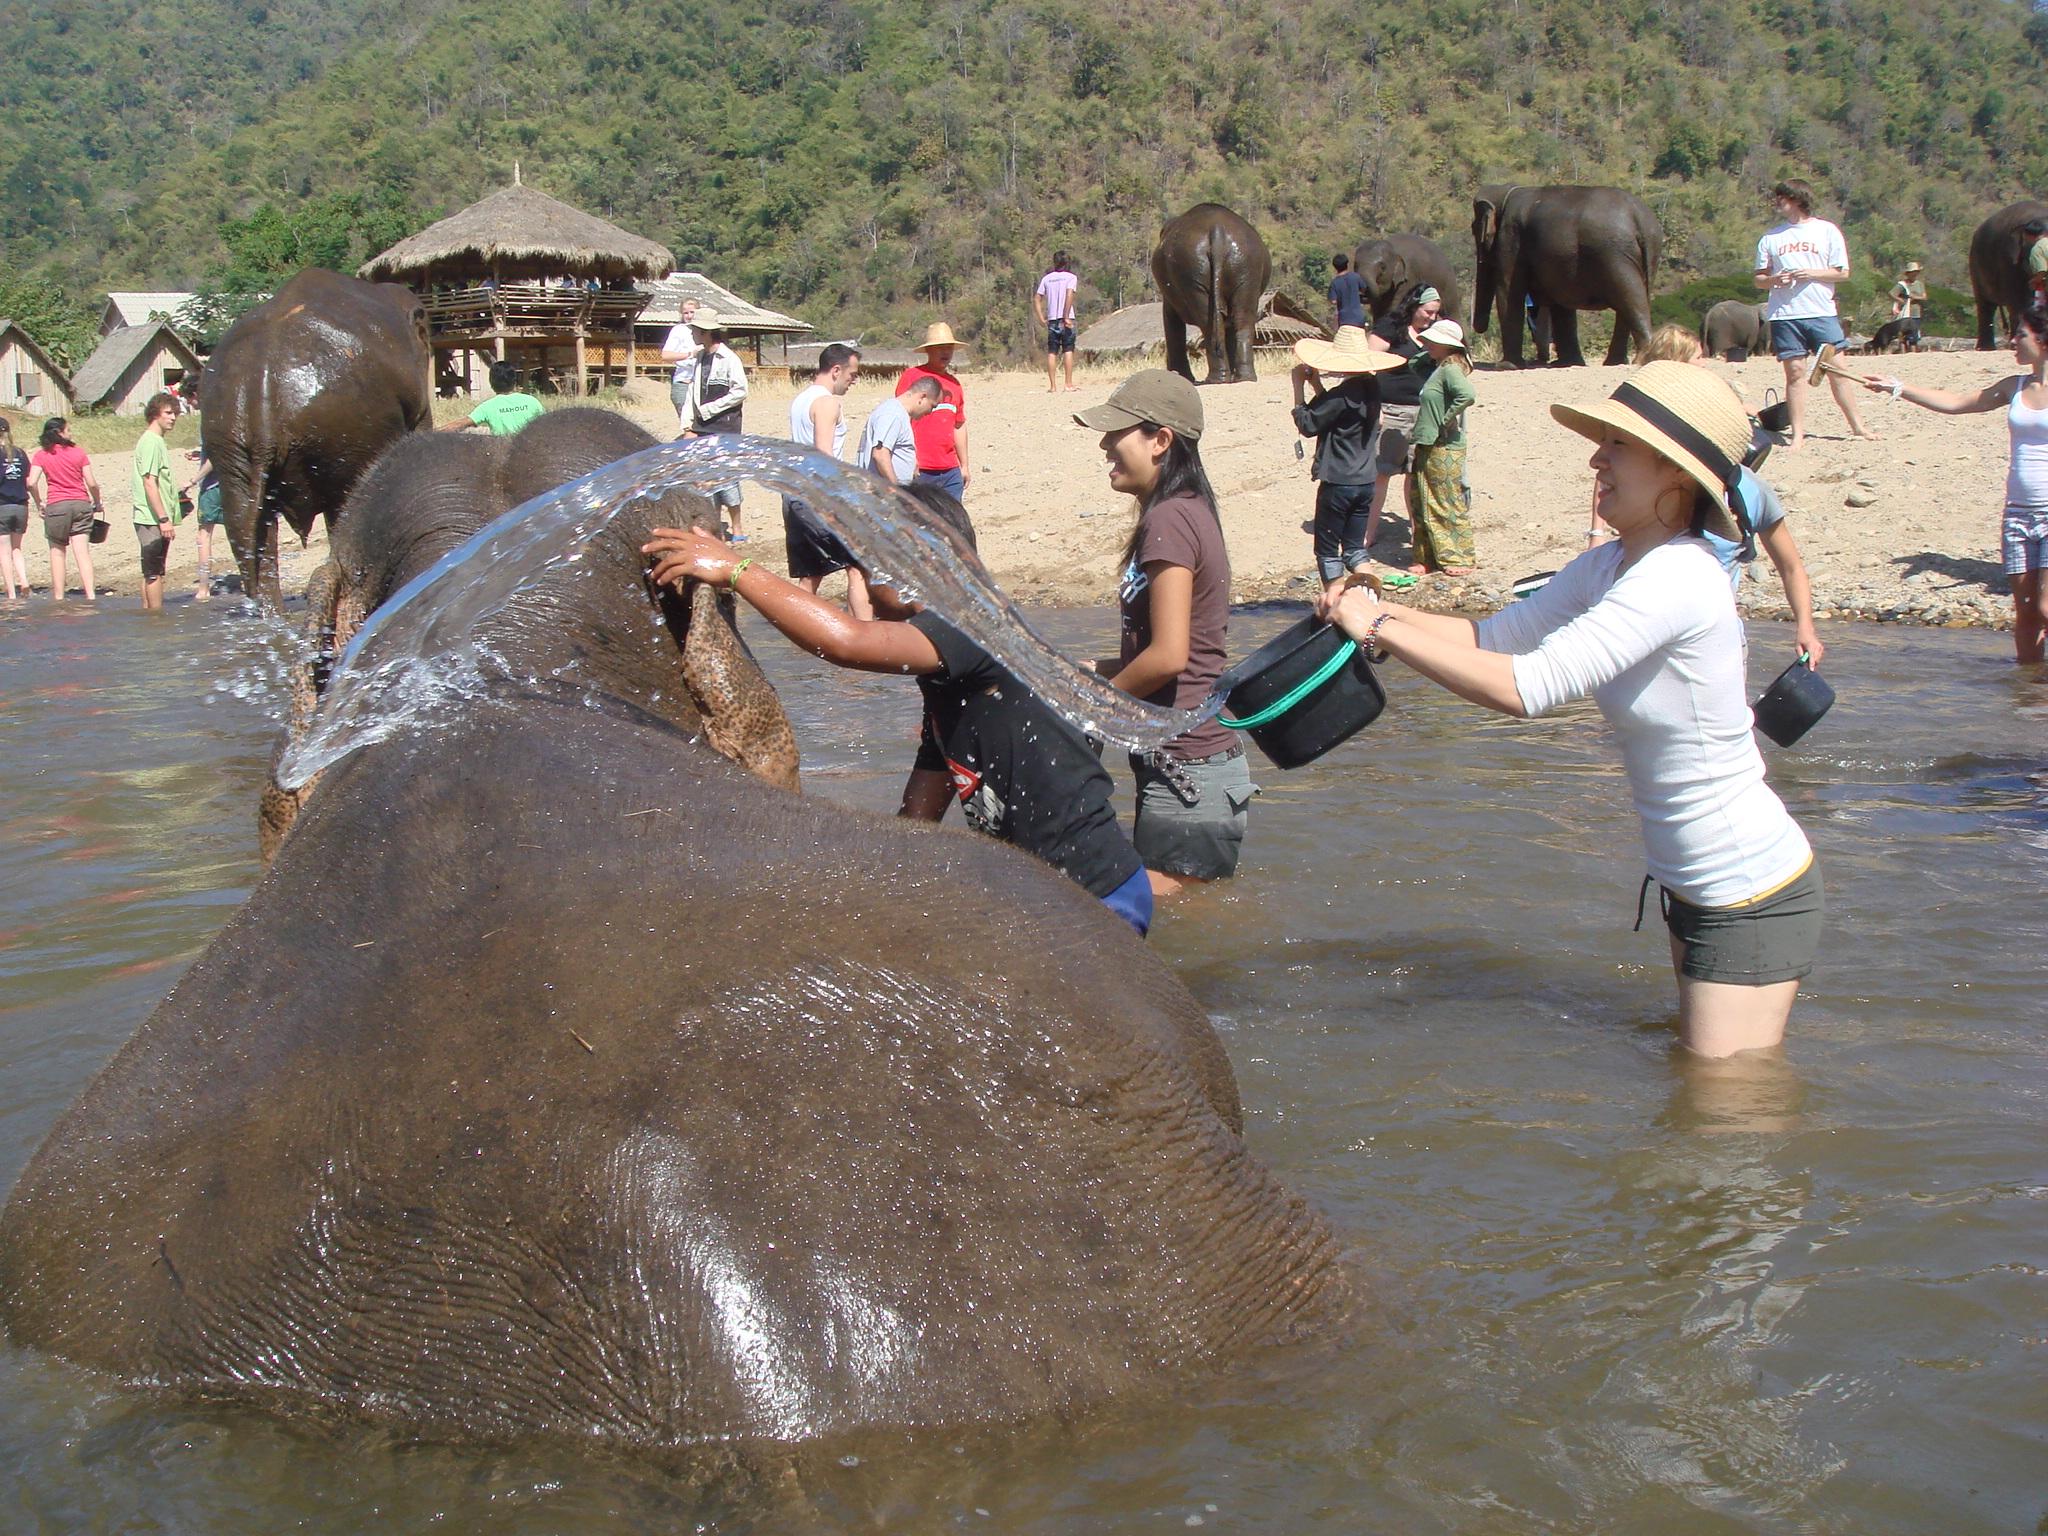 File:Elephant nature park.JPG - Wikipedia